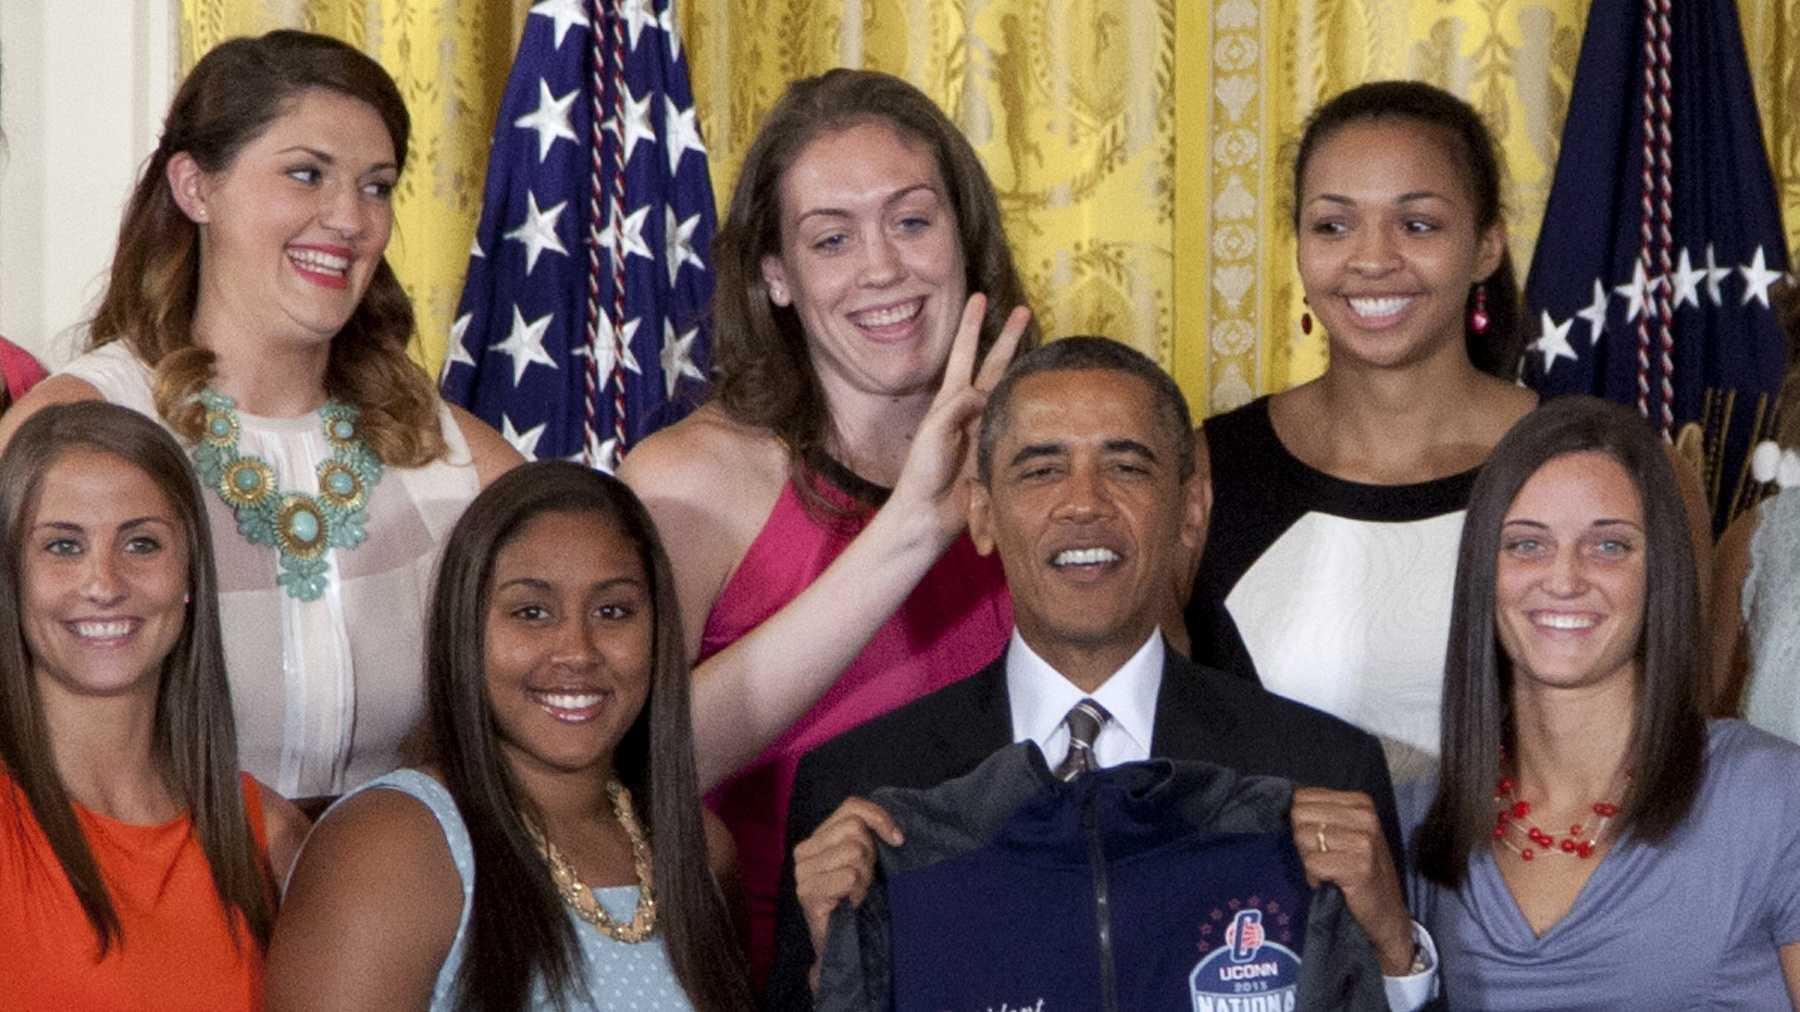 UConn with Obama